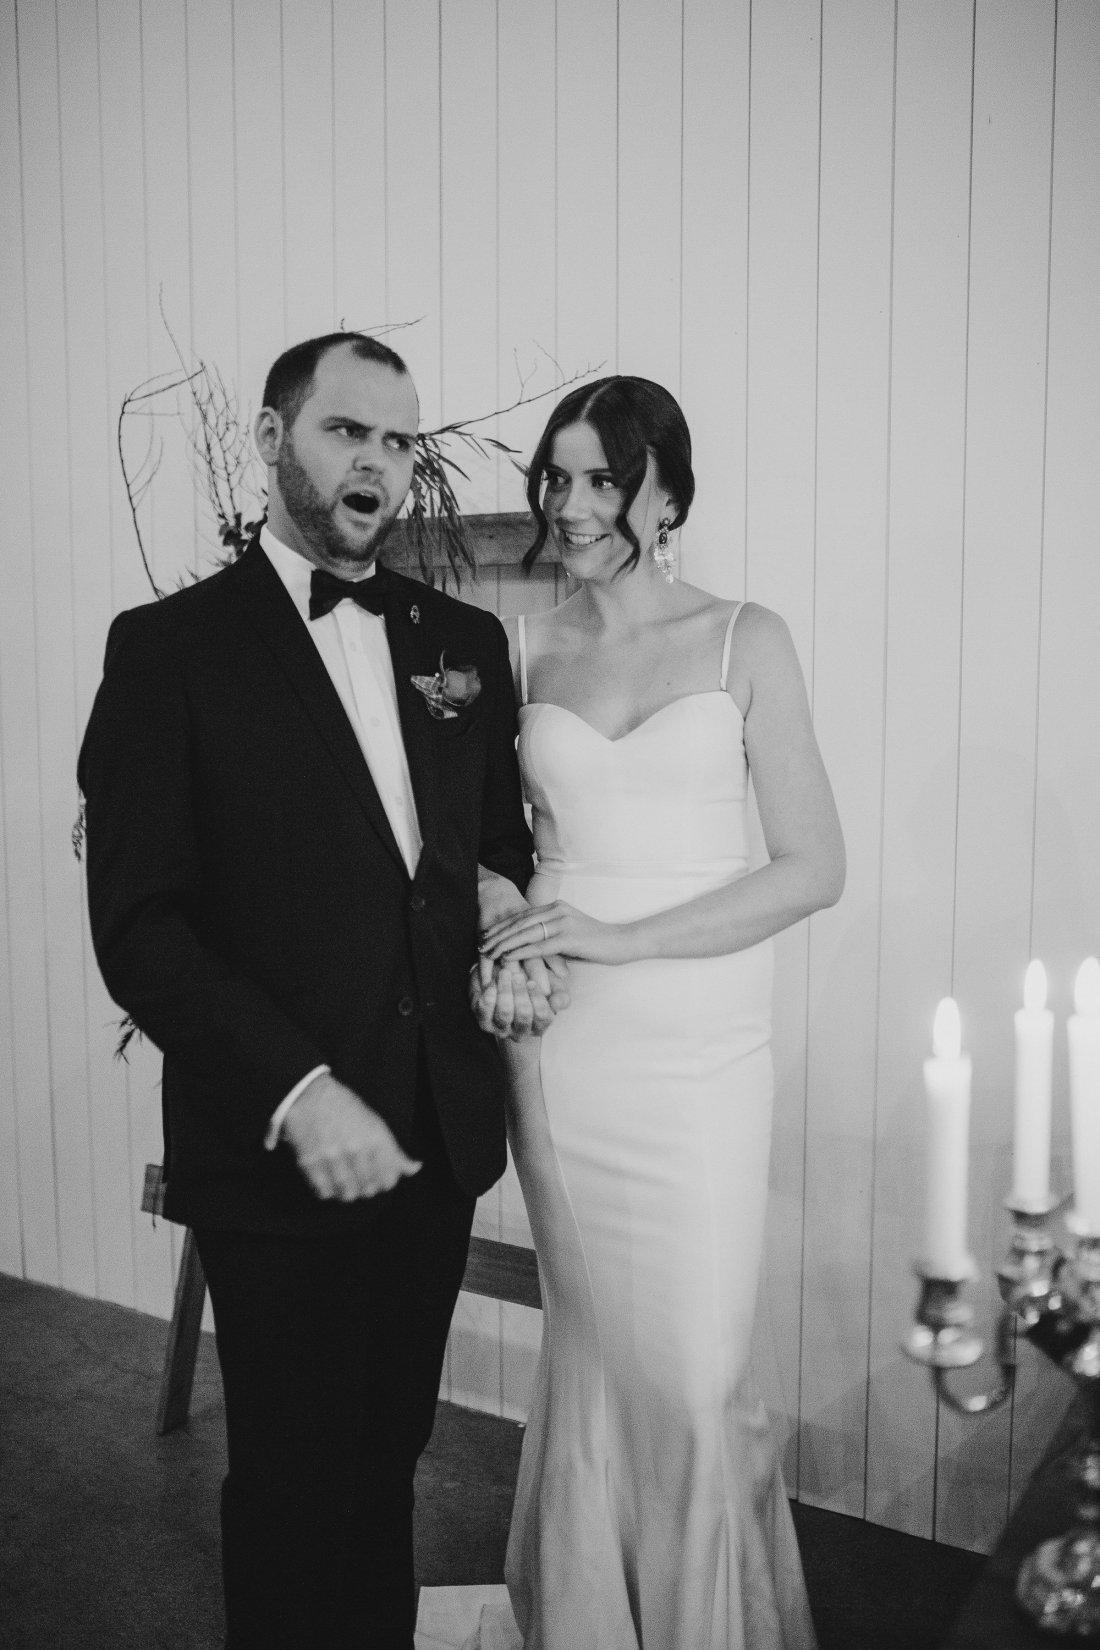 Old Pickle Factory Wedding | Perth Wedding Photographer | Night Wedding Perth | Ebony Blush Photography | Zoe Theiadore | C+T62